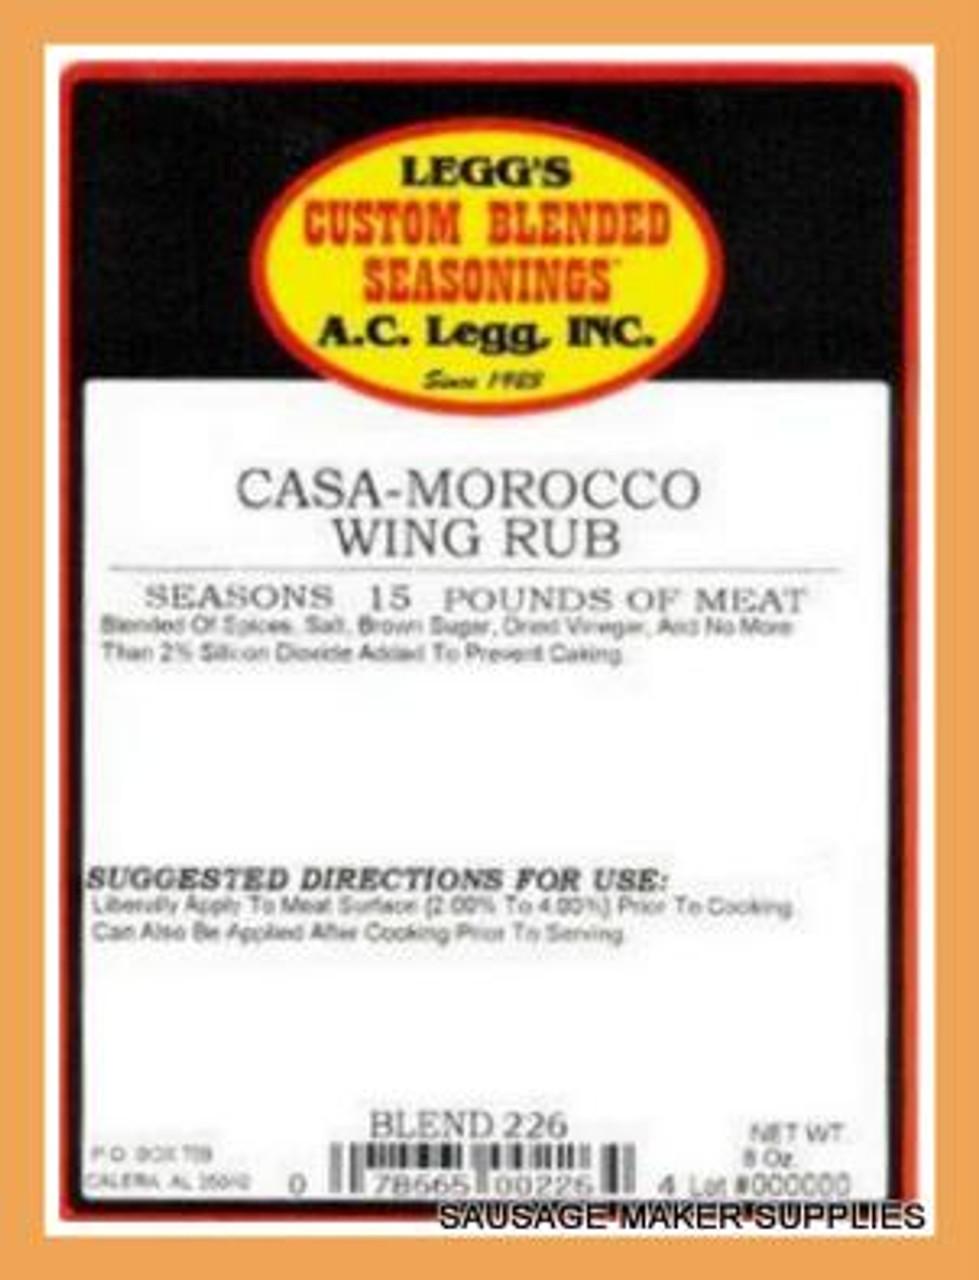 AC LEGG OLD PLANTATION CASA-MOROCCO WING RUB